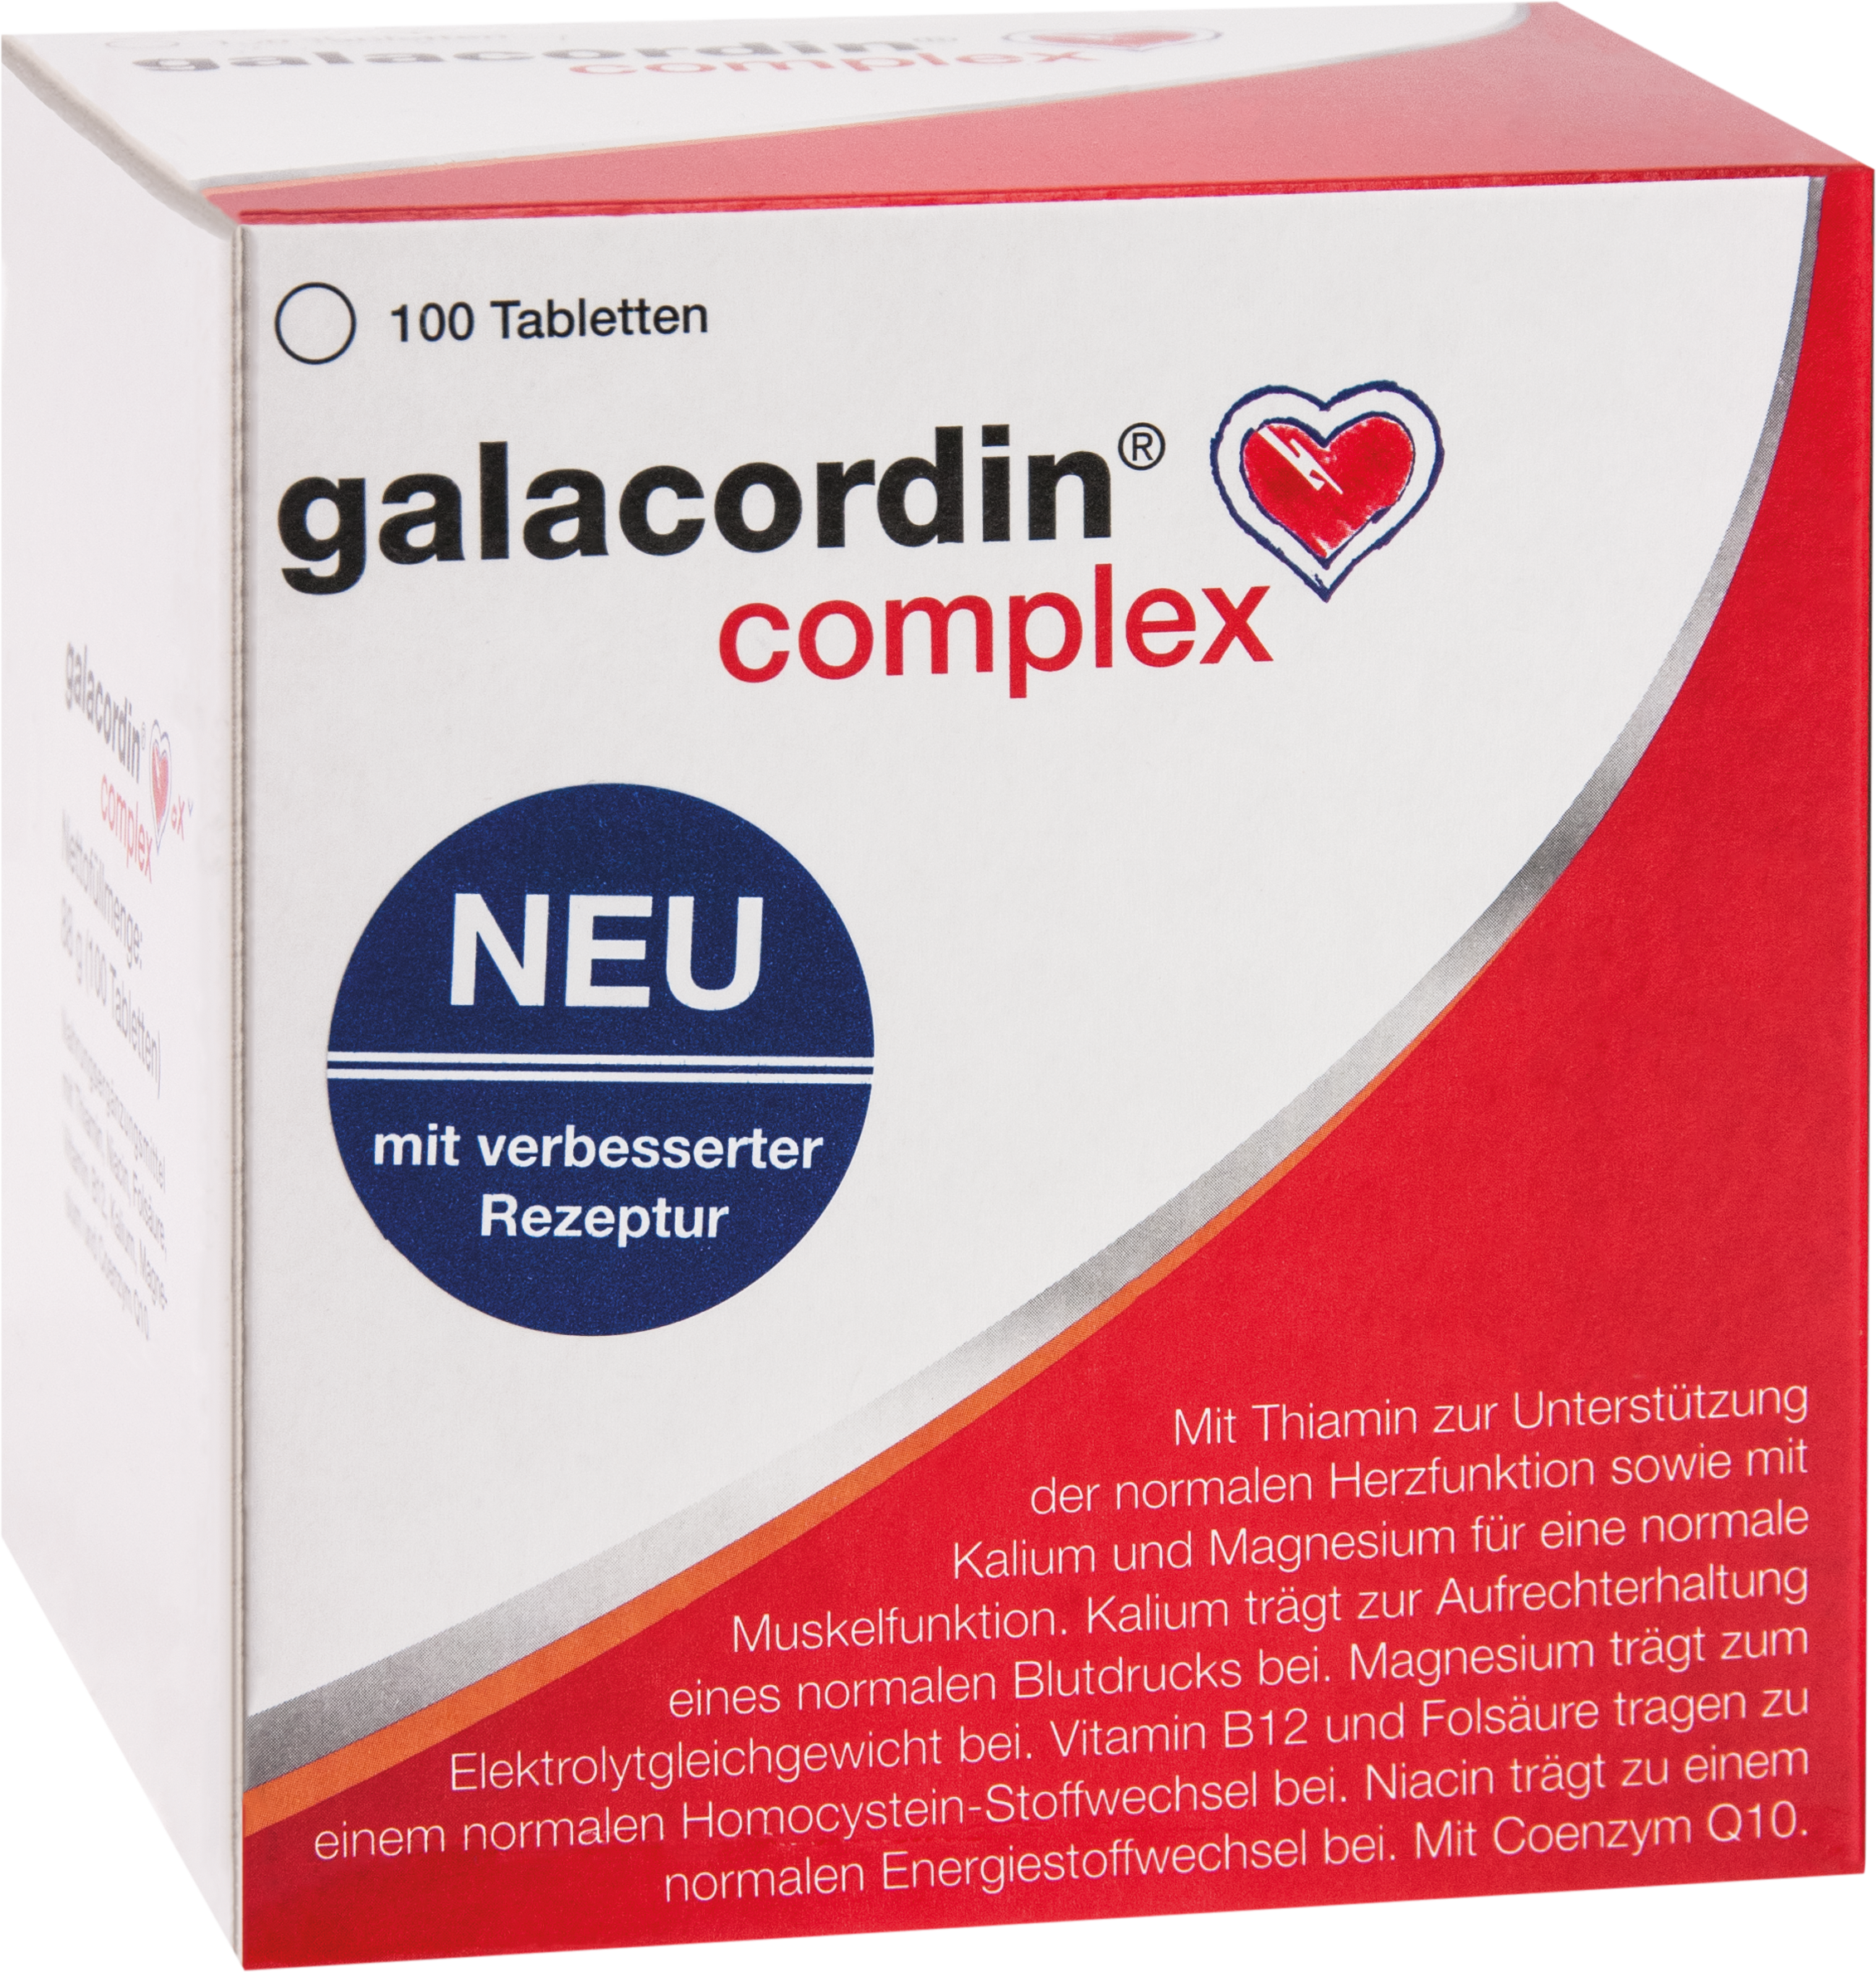 galacordin complex